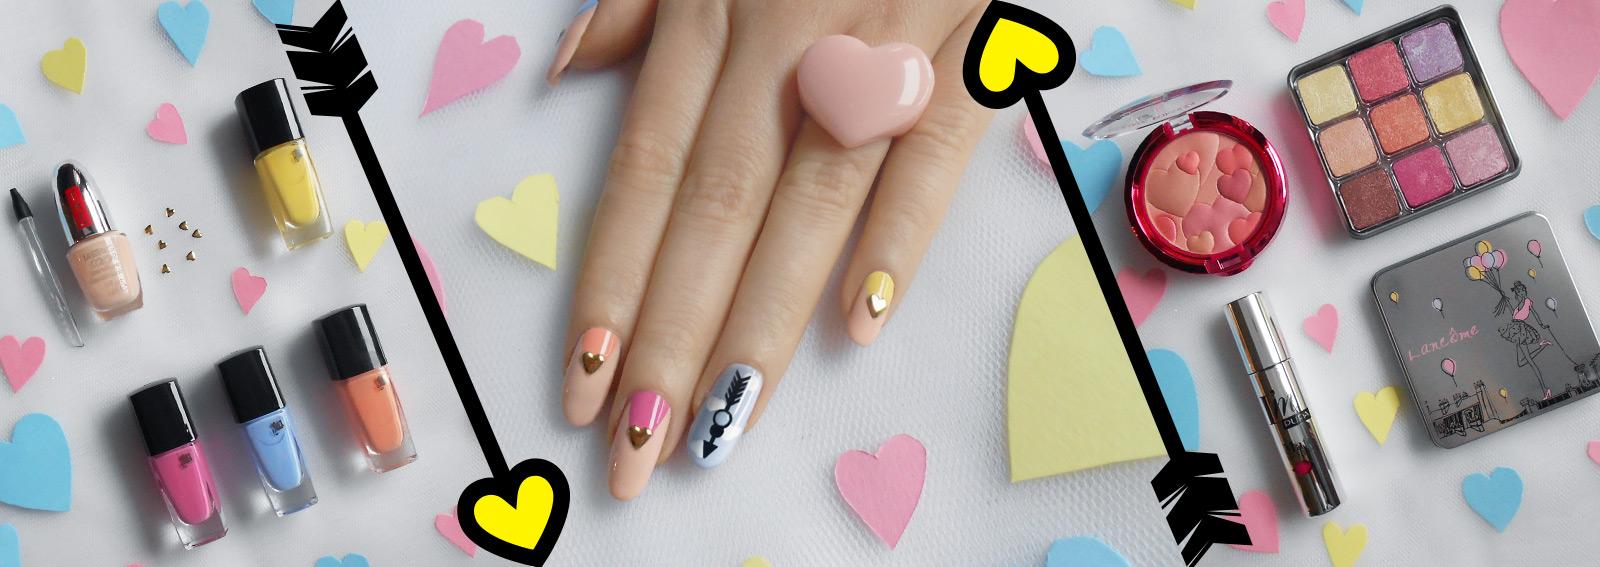 cover-nail-art-di-san-valentino-desktop